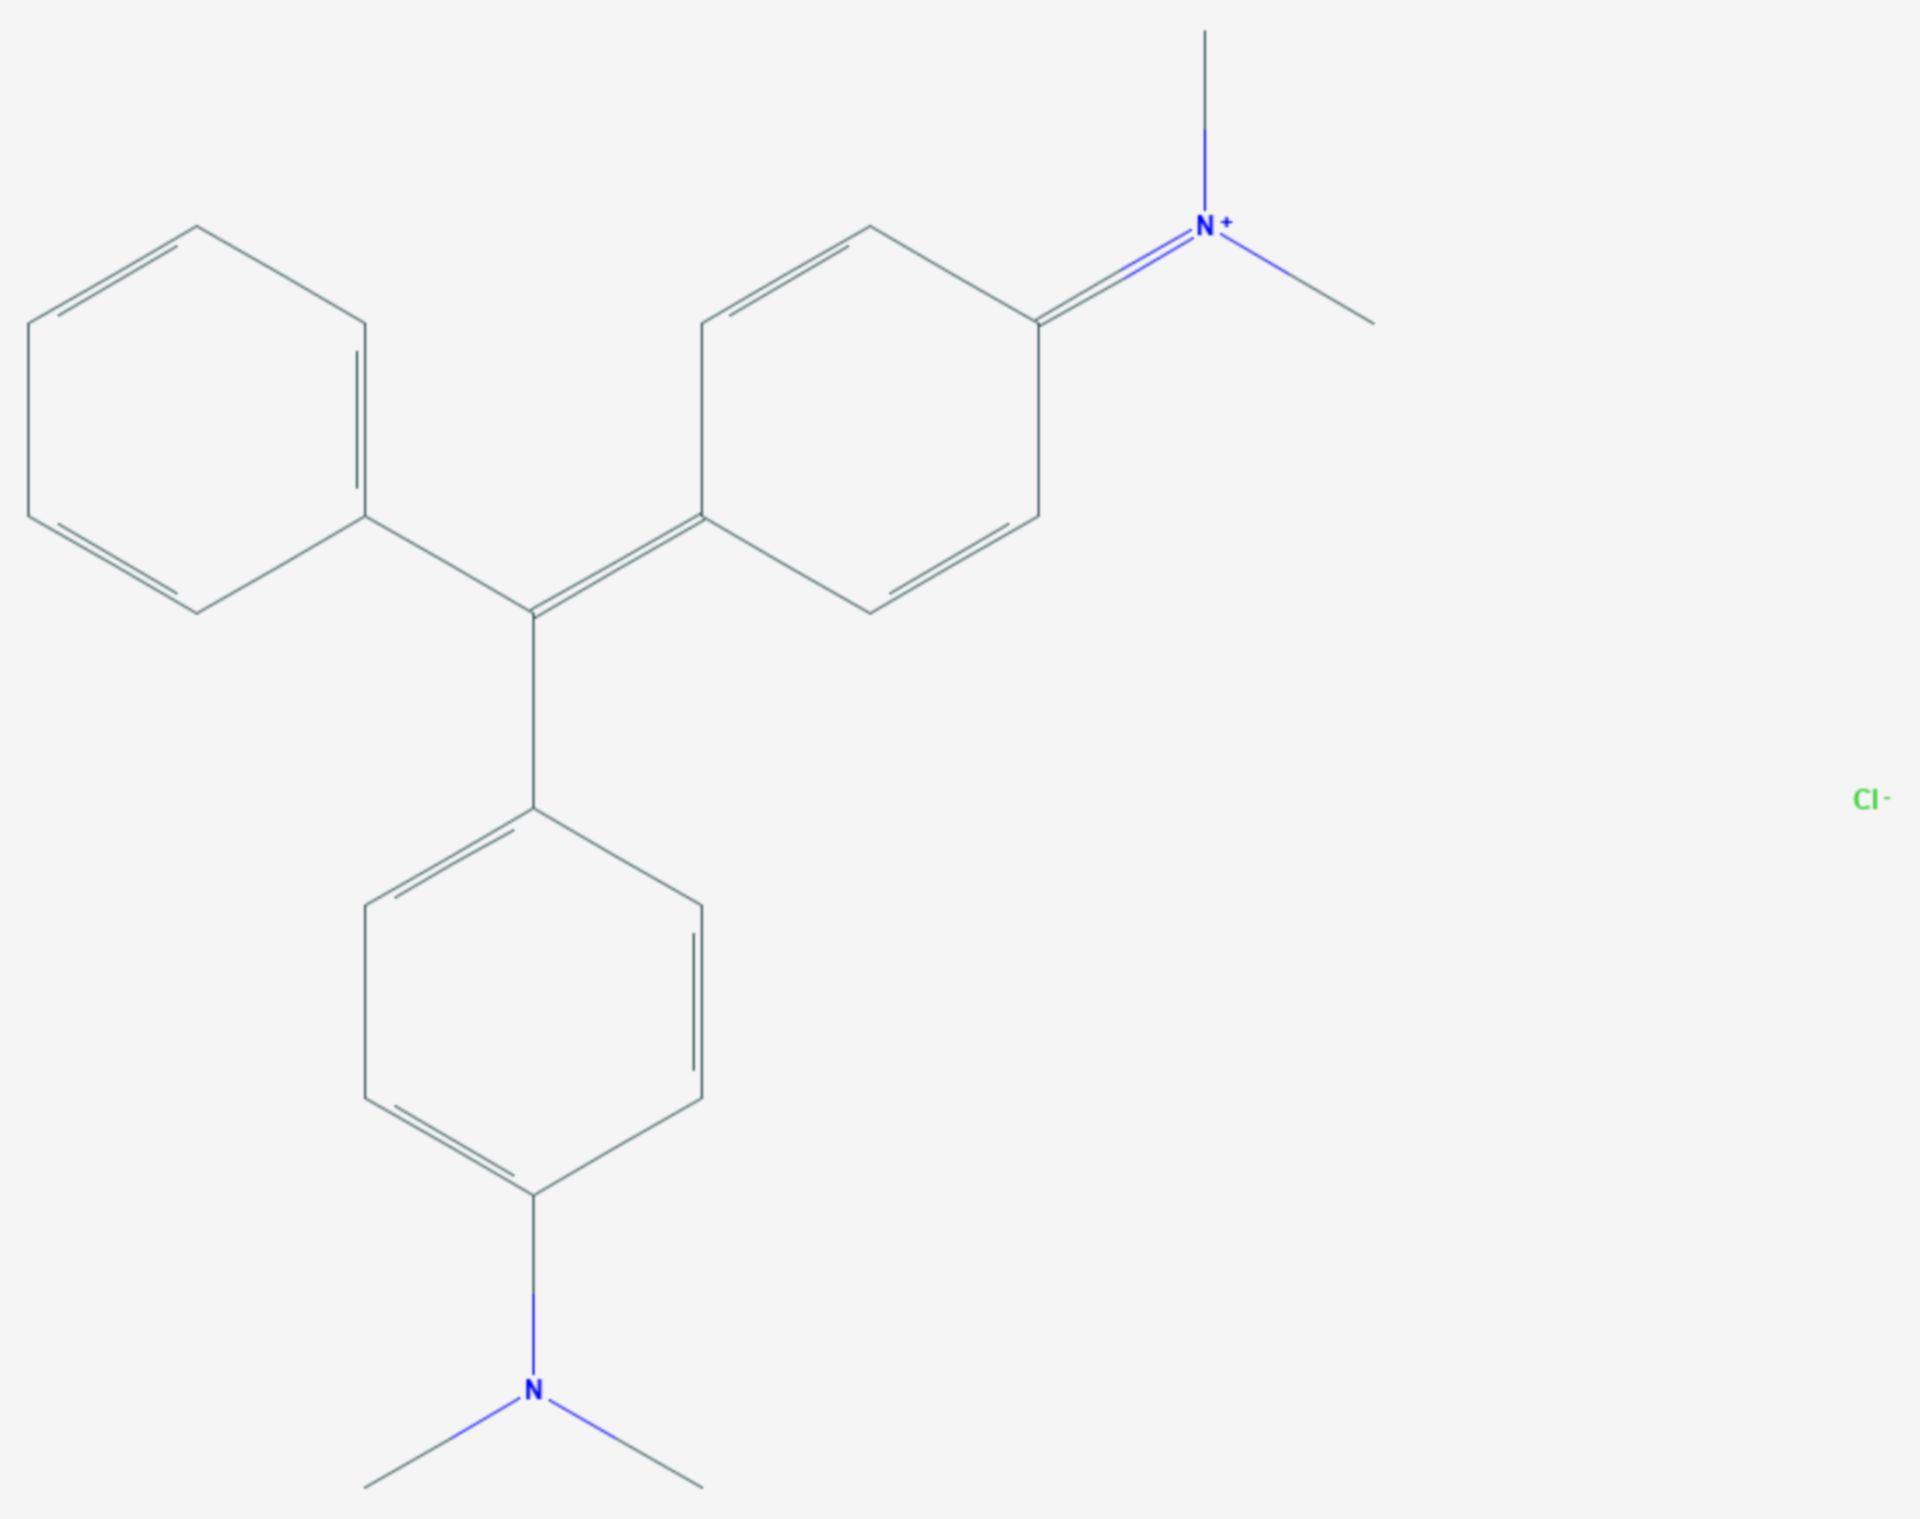 Malachitgrün (Strukturformel)